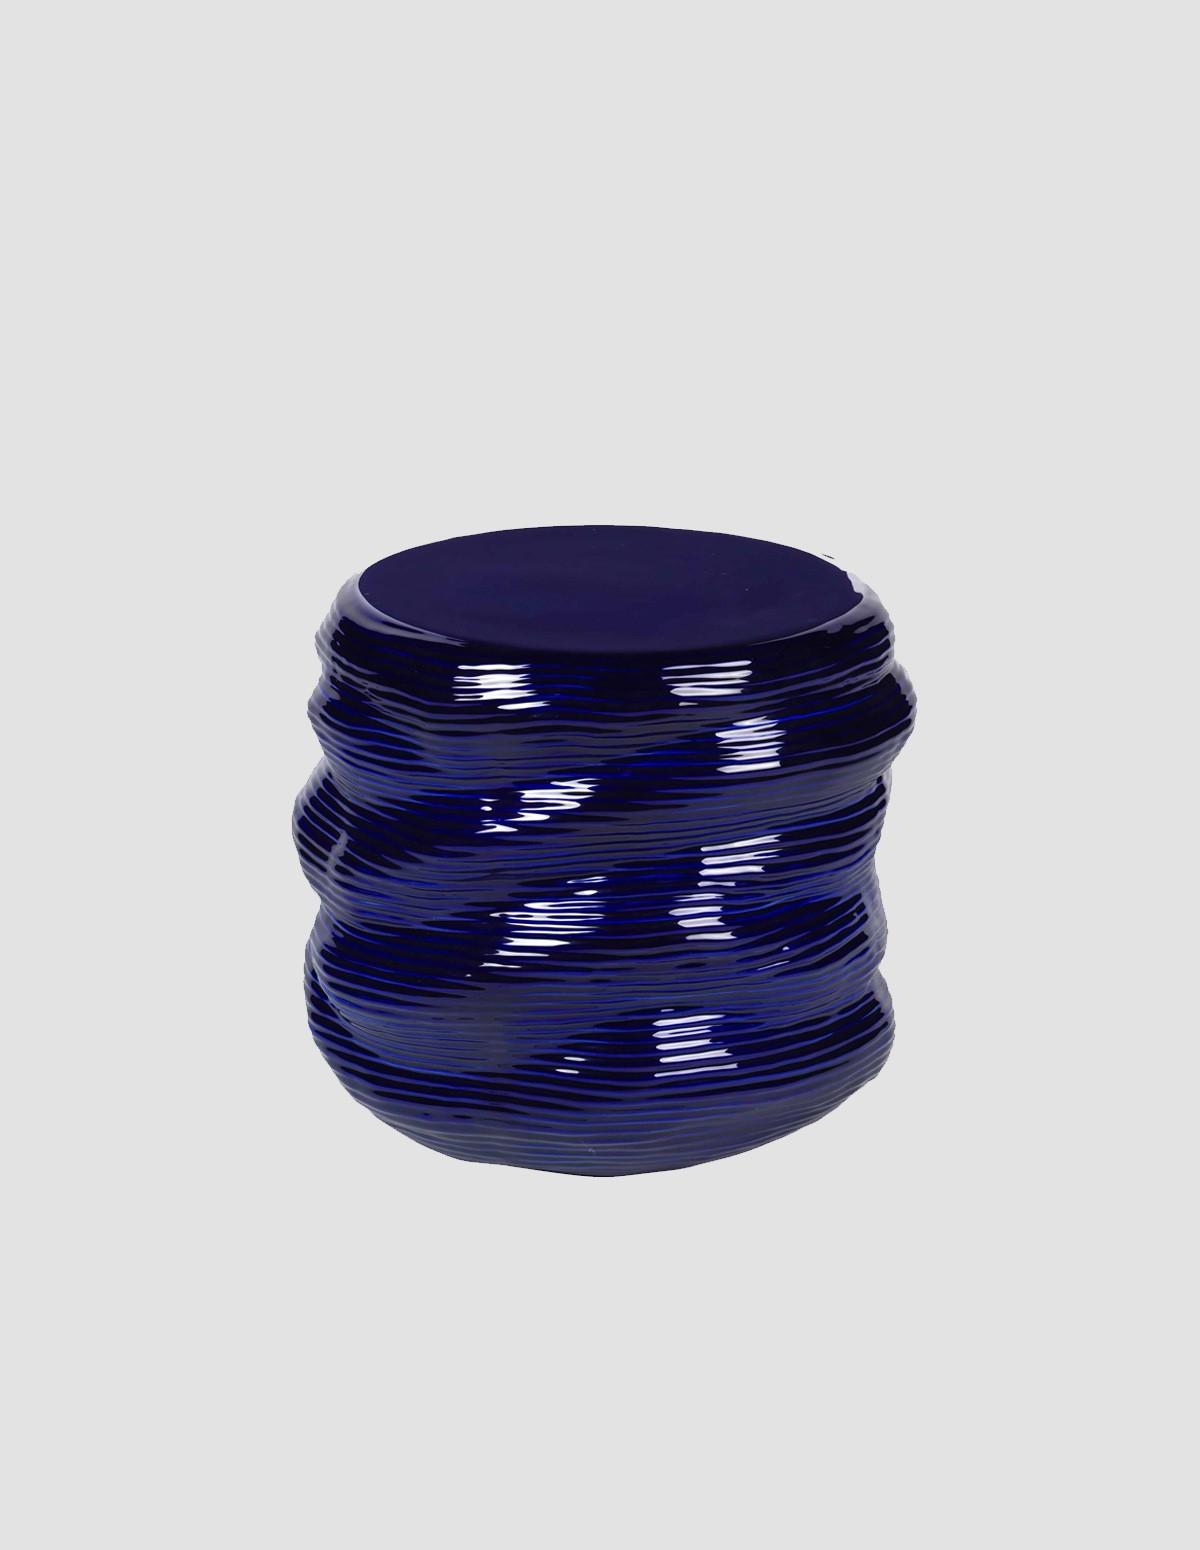 Bc Table Earthenware Gres - DARK BLUE